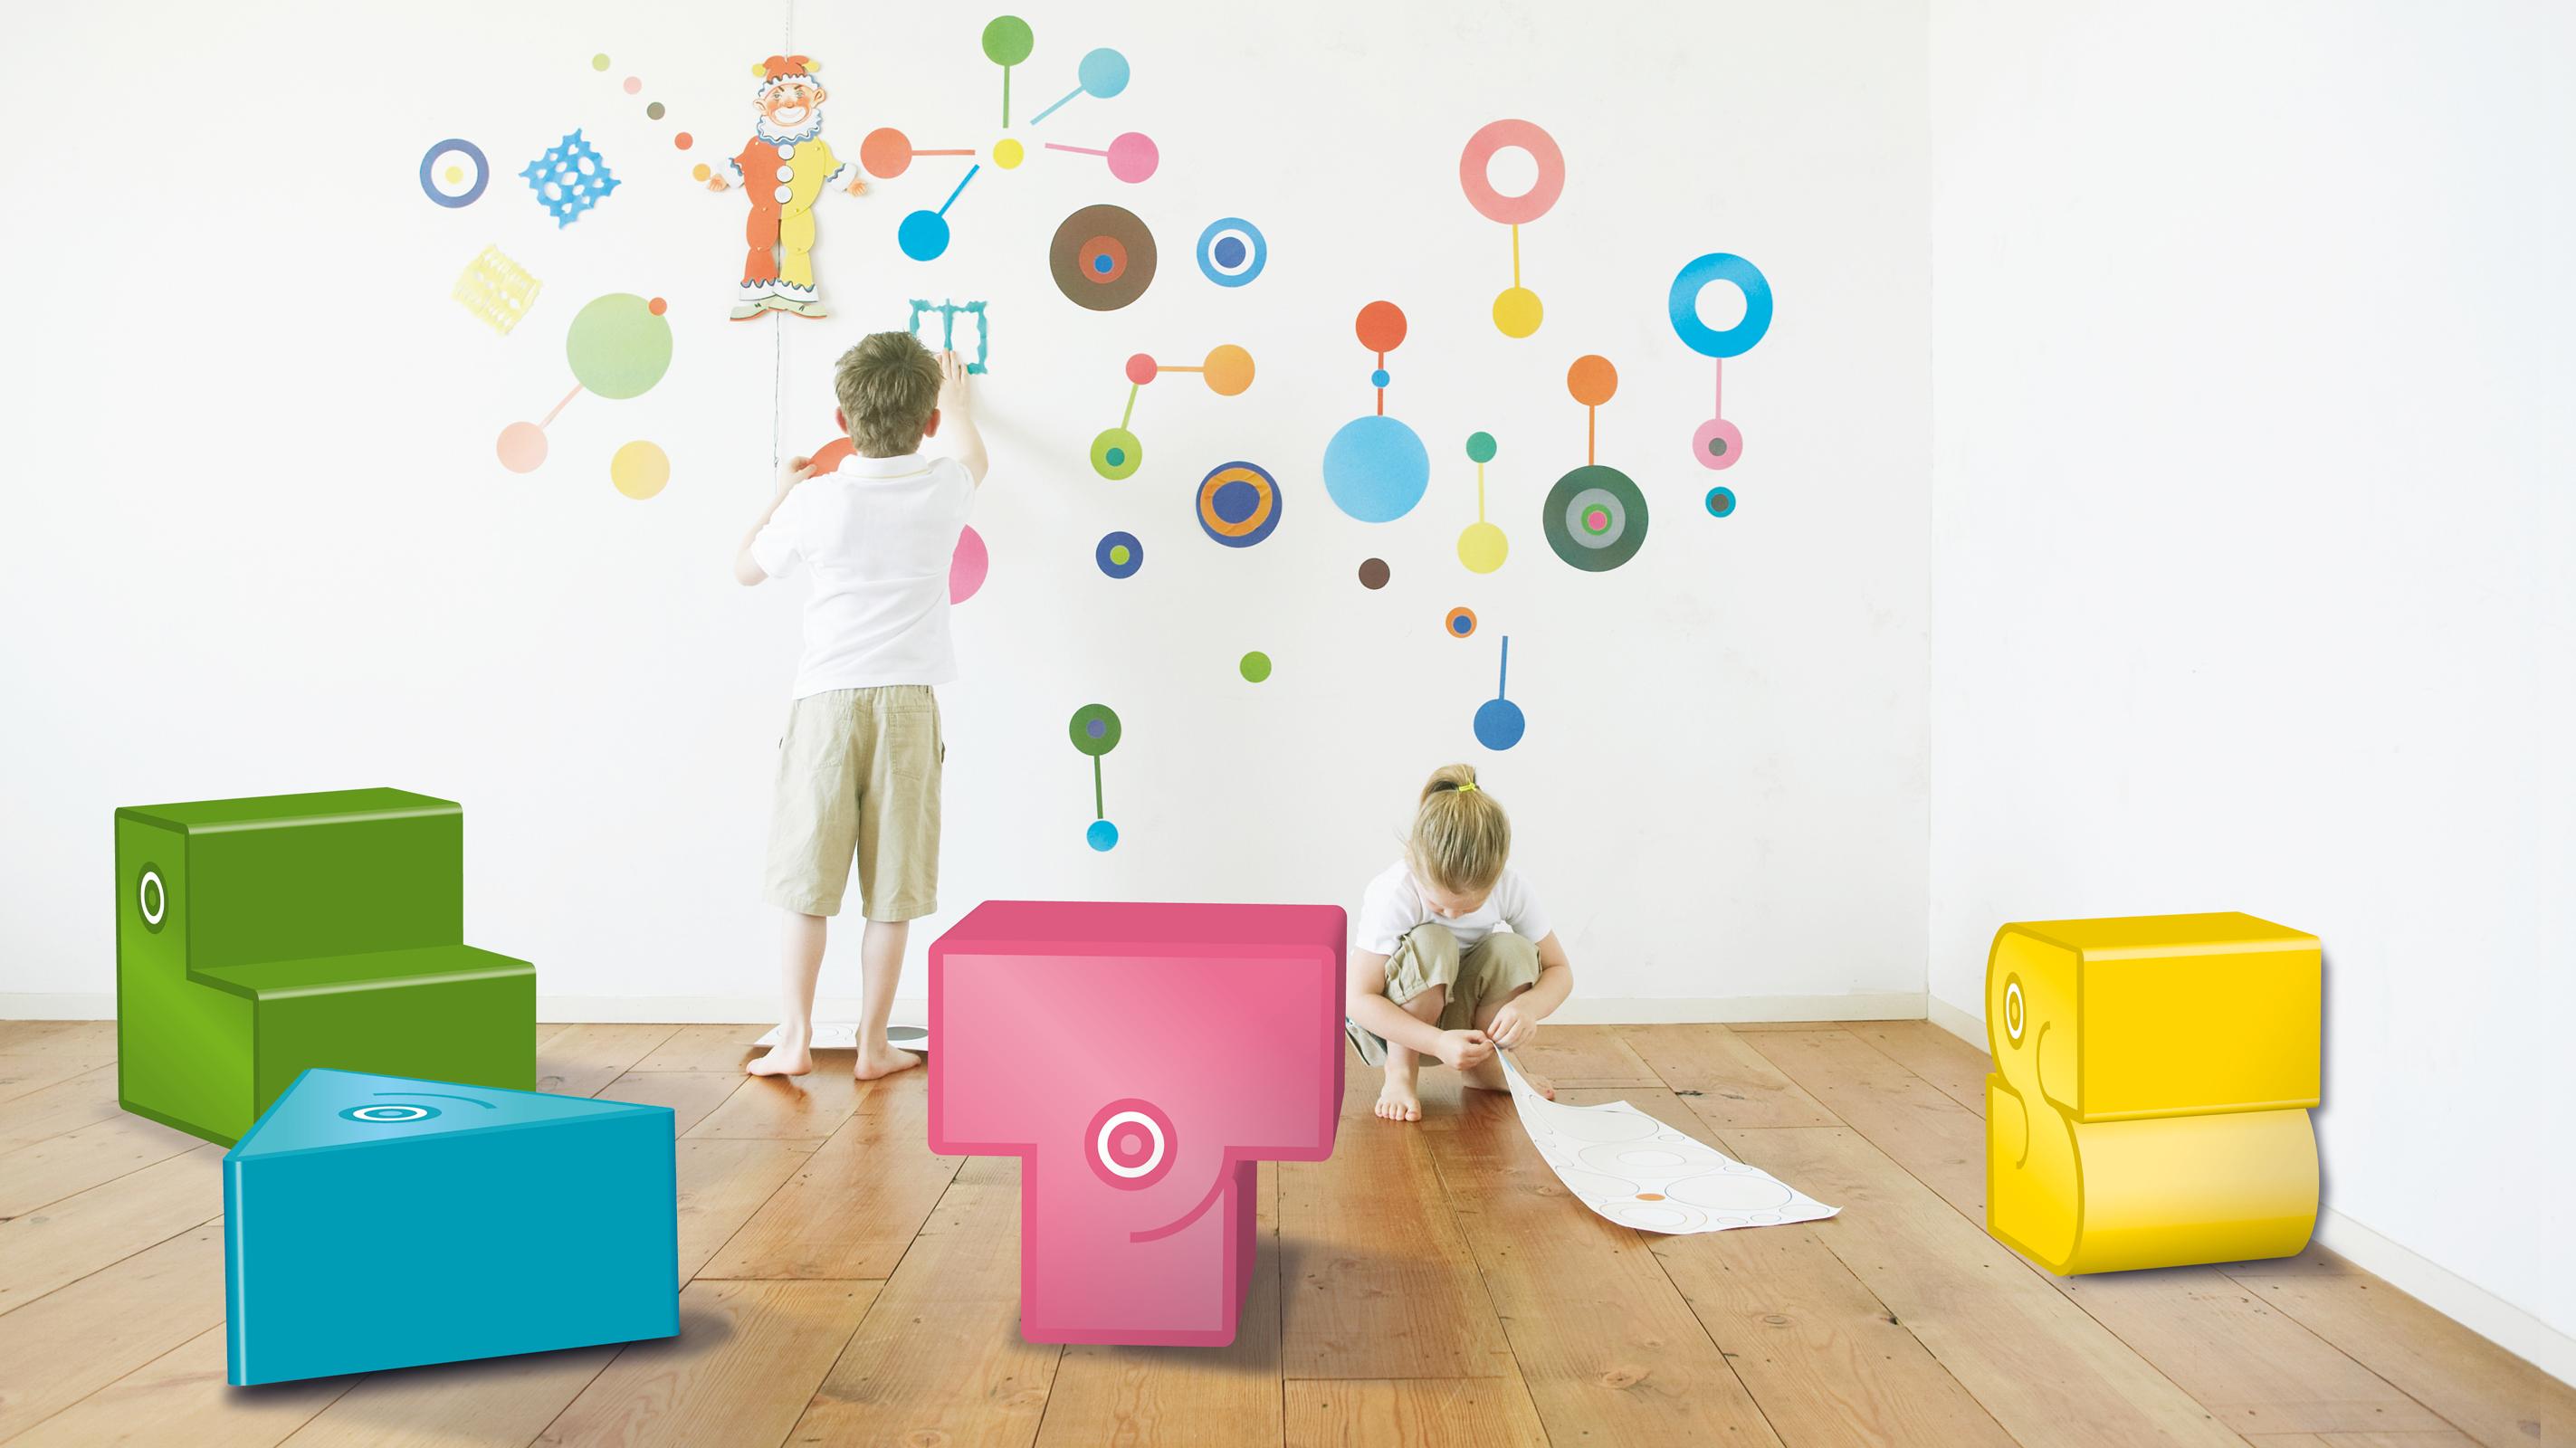 Kleinsteins Kita – Poarangan Brand Design9